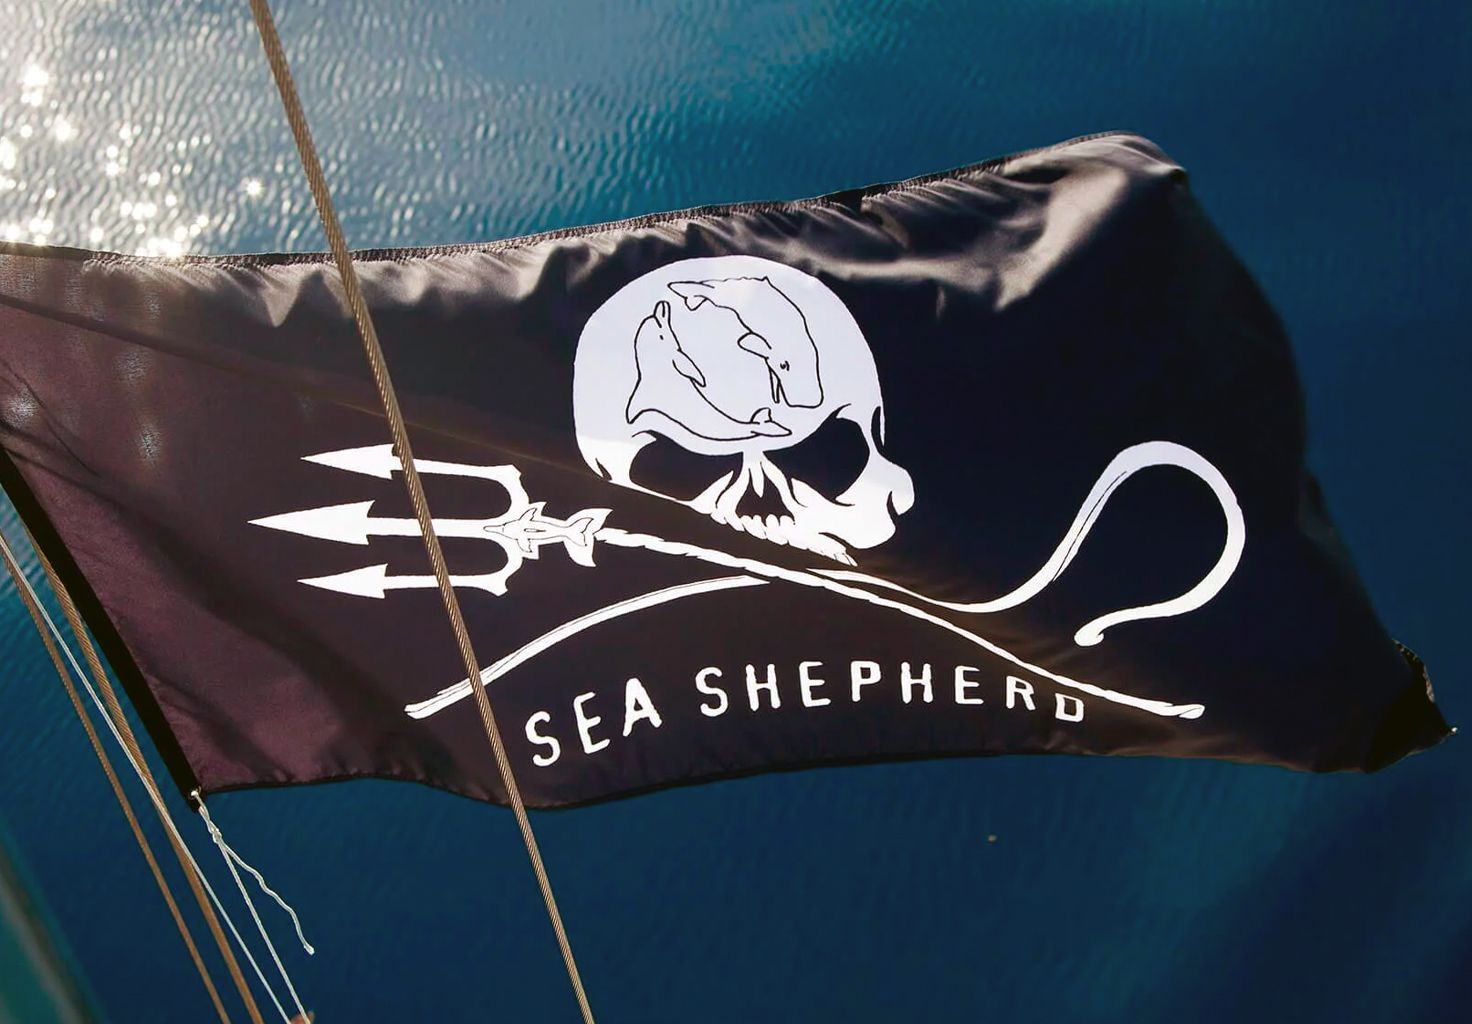 A photo of a Sea Shepherd flag.